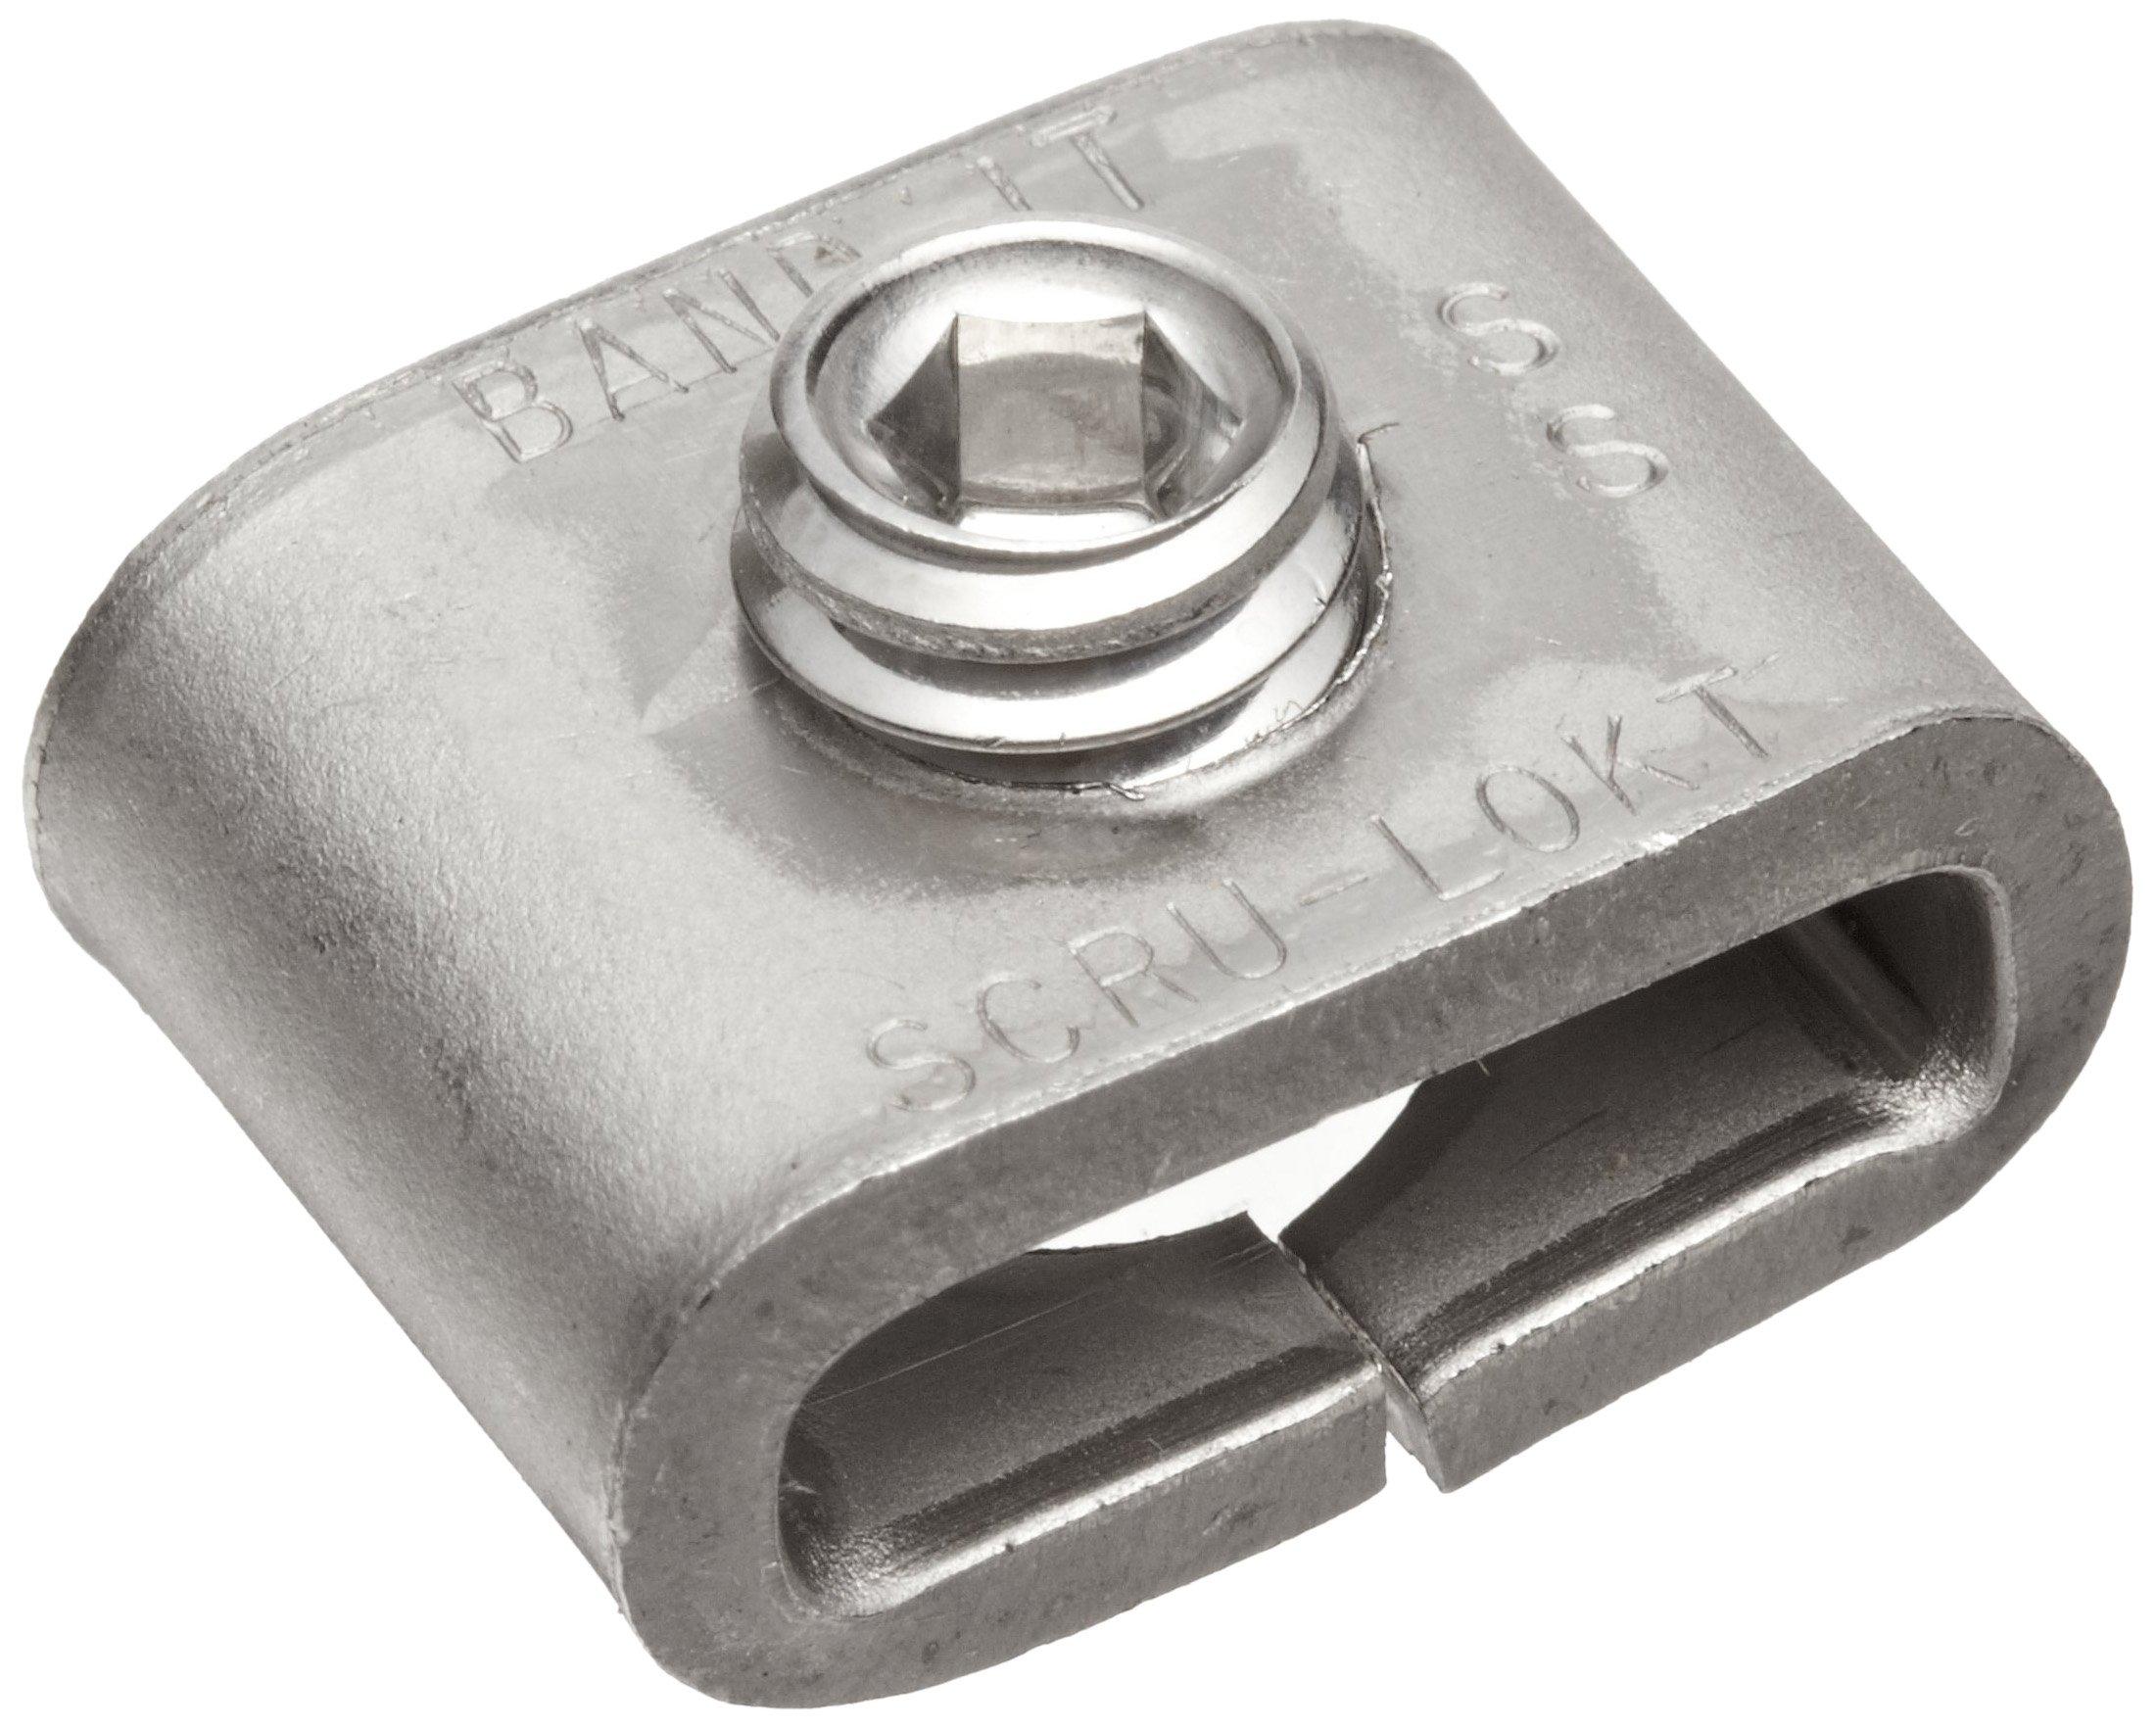 BAND-IT C72699 201 Stainless Steel Scru-Lokt Style Buckle, 3/4'' Width, 25 per Box